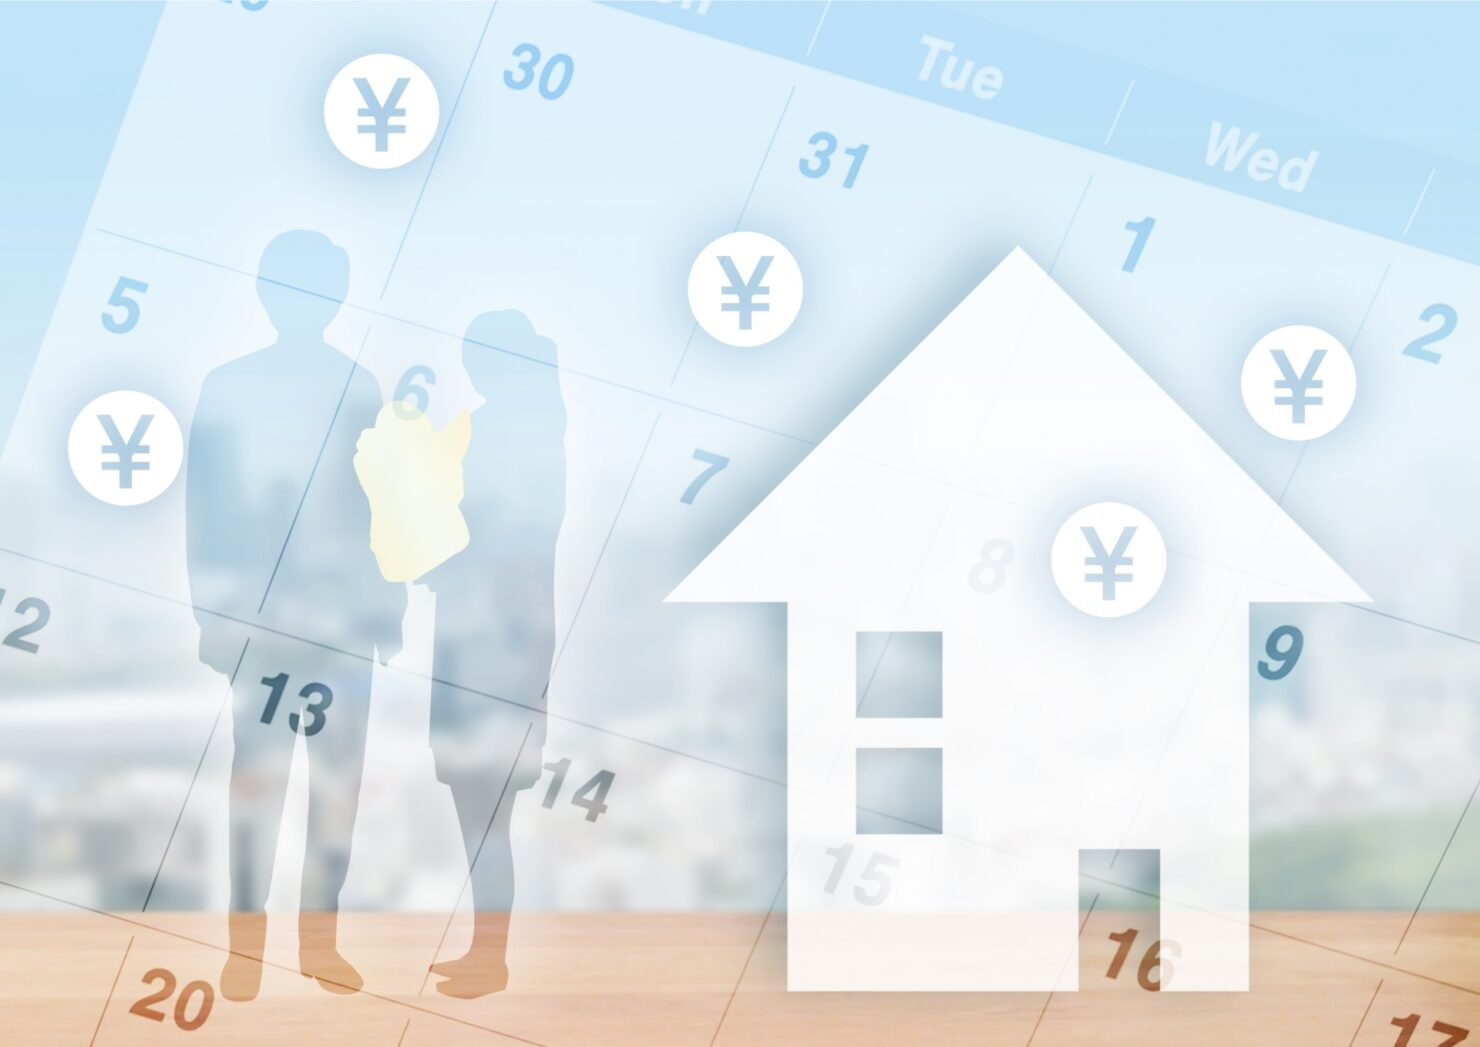 【FP監修】夫婦共働き世帯の平均年収は? 共働きの家事負担やパパママの口座管理はどうしてる?